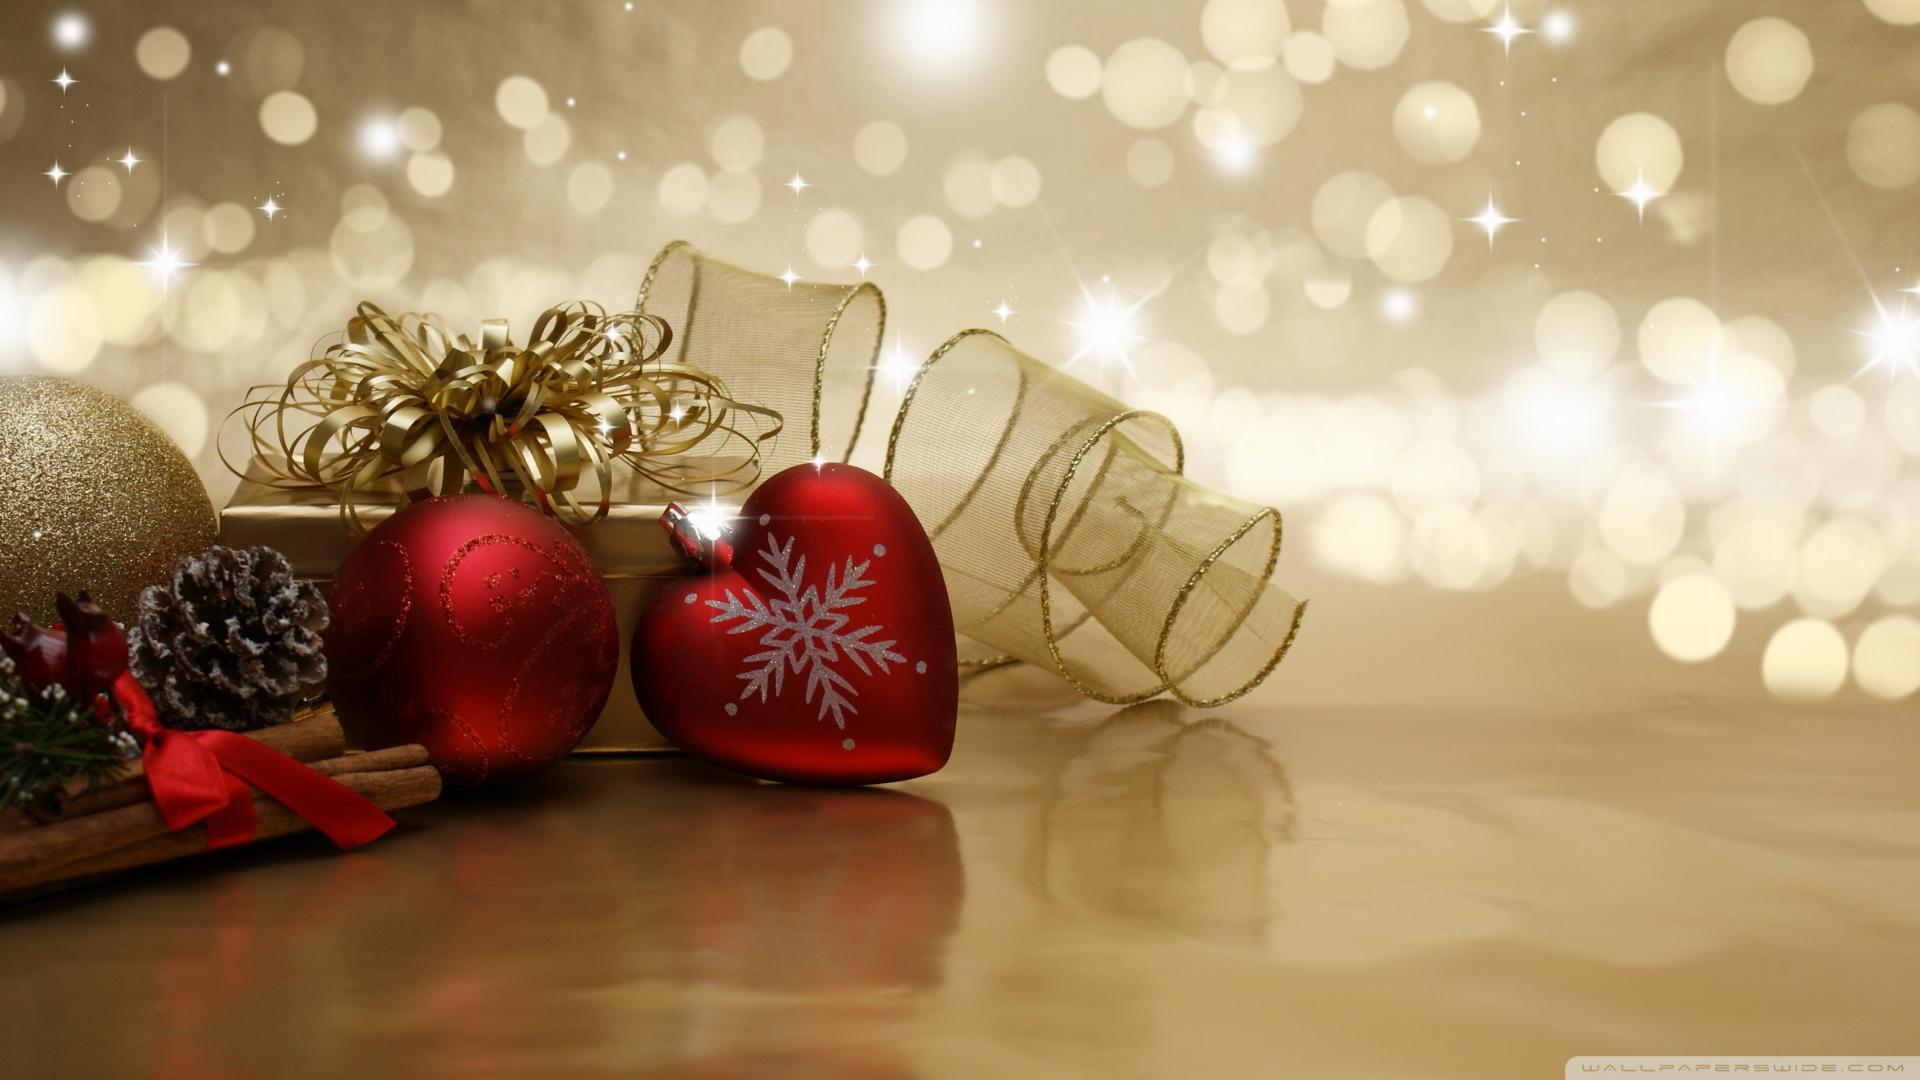 christmas-http-thecelebrityspy-com-kylie-jenner-the-hottest-secret-of-his-bo-wallpaper-wp3403907